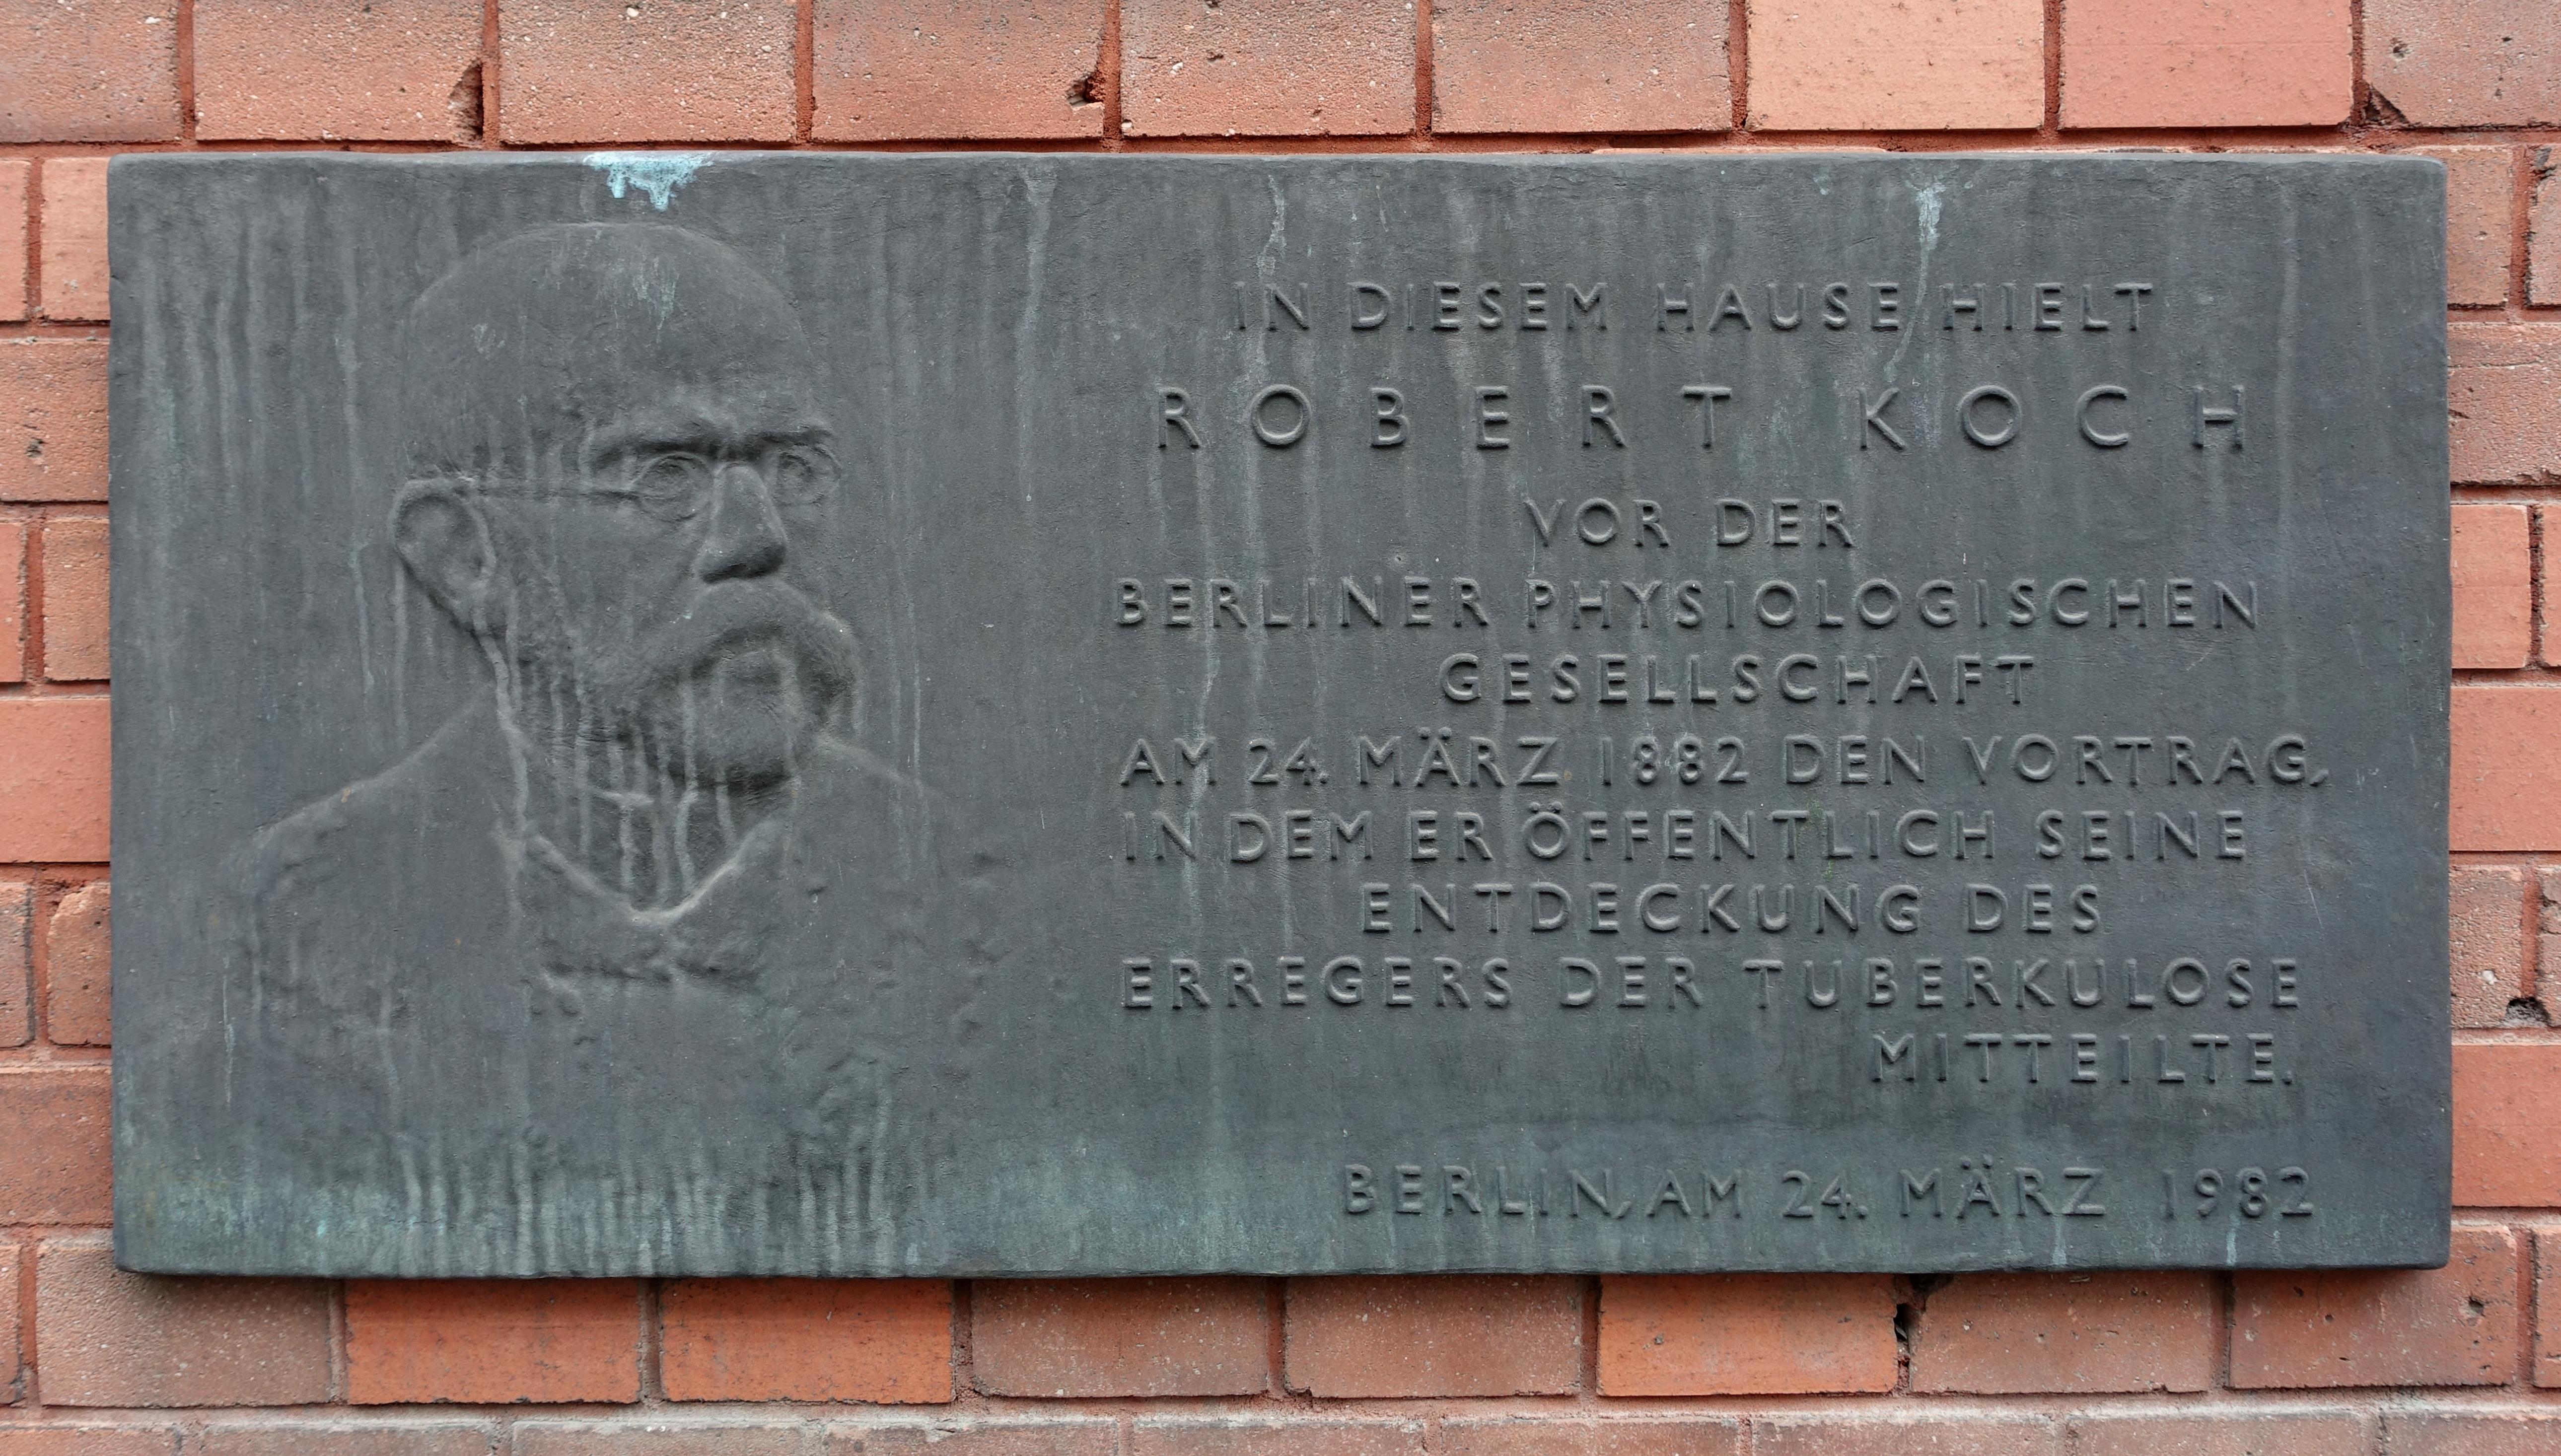 Robert koch steckbrief promi for Koch deutschland